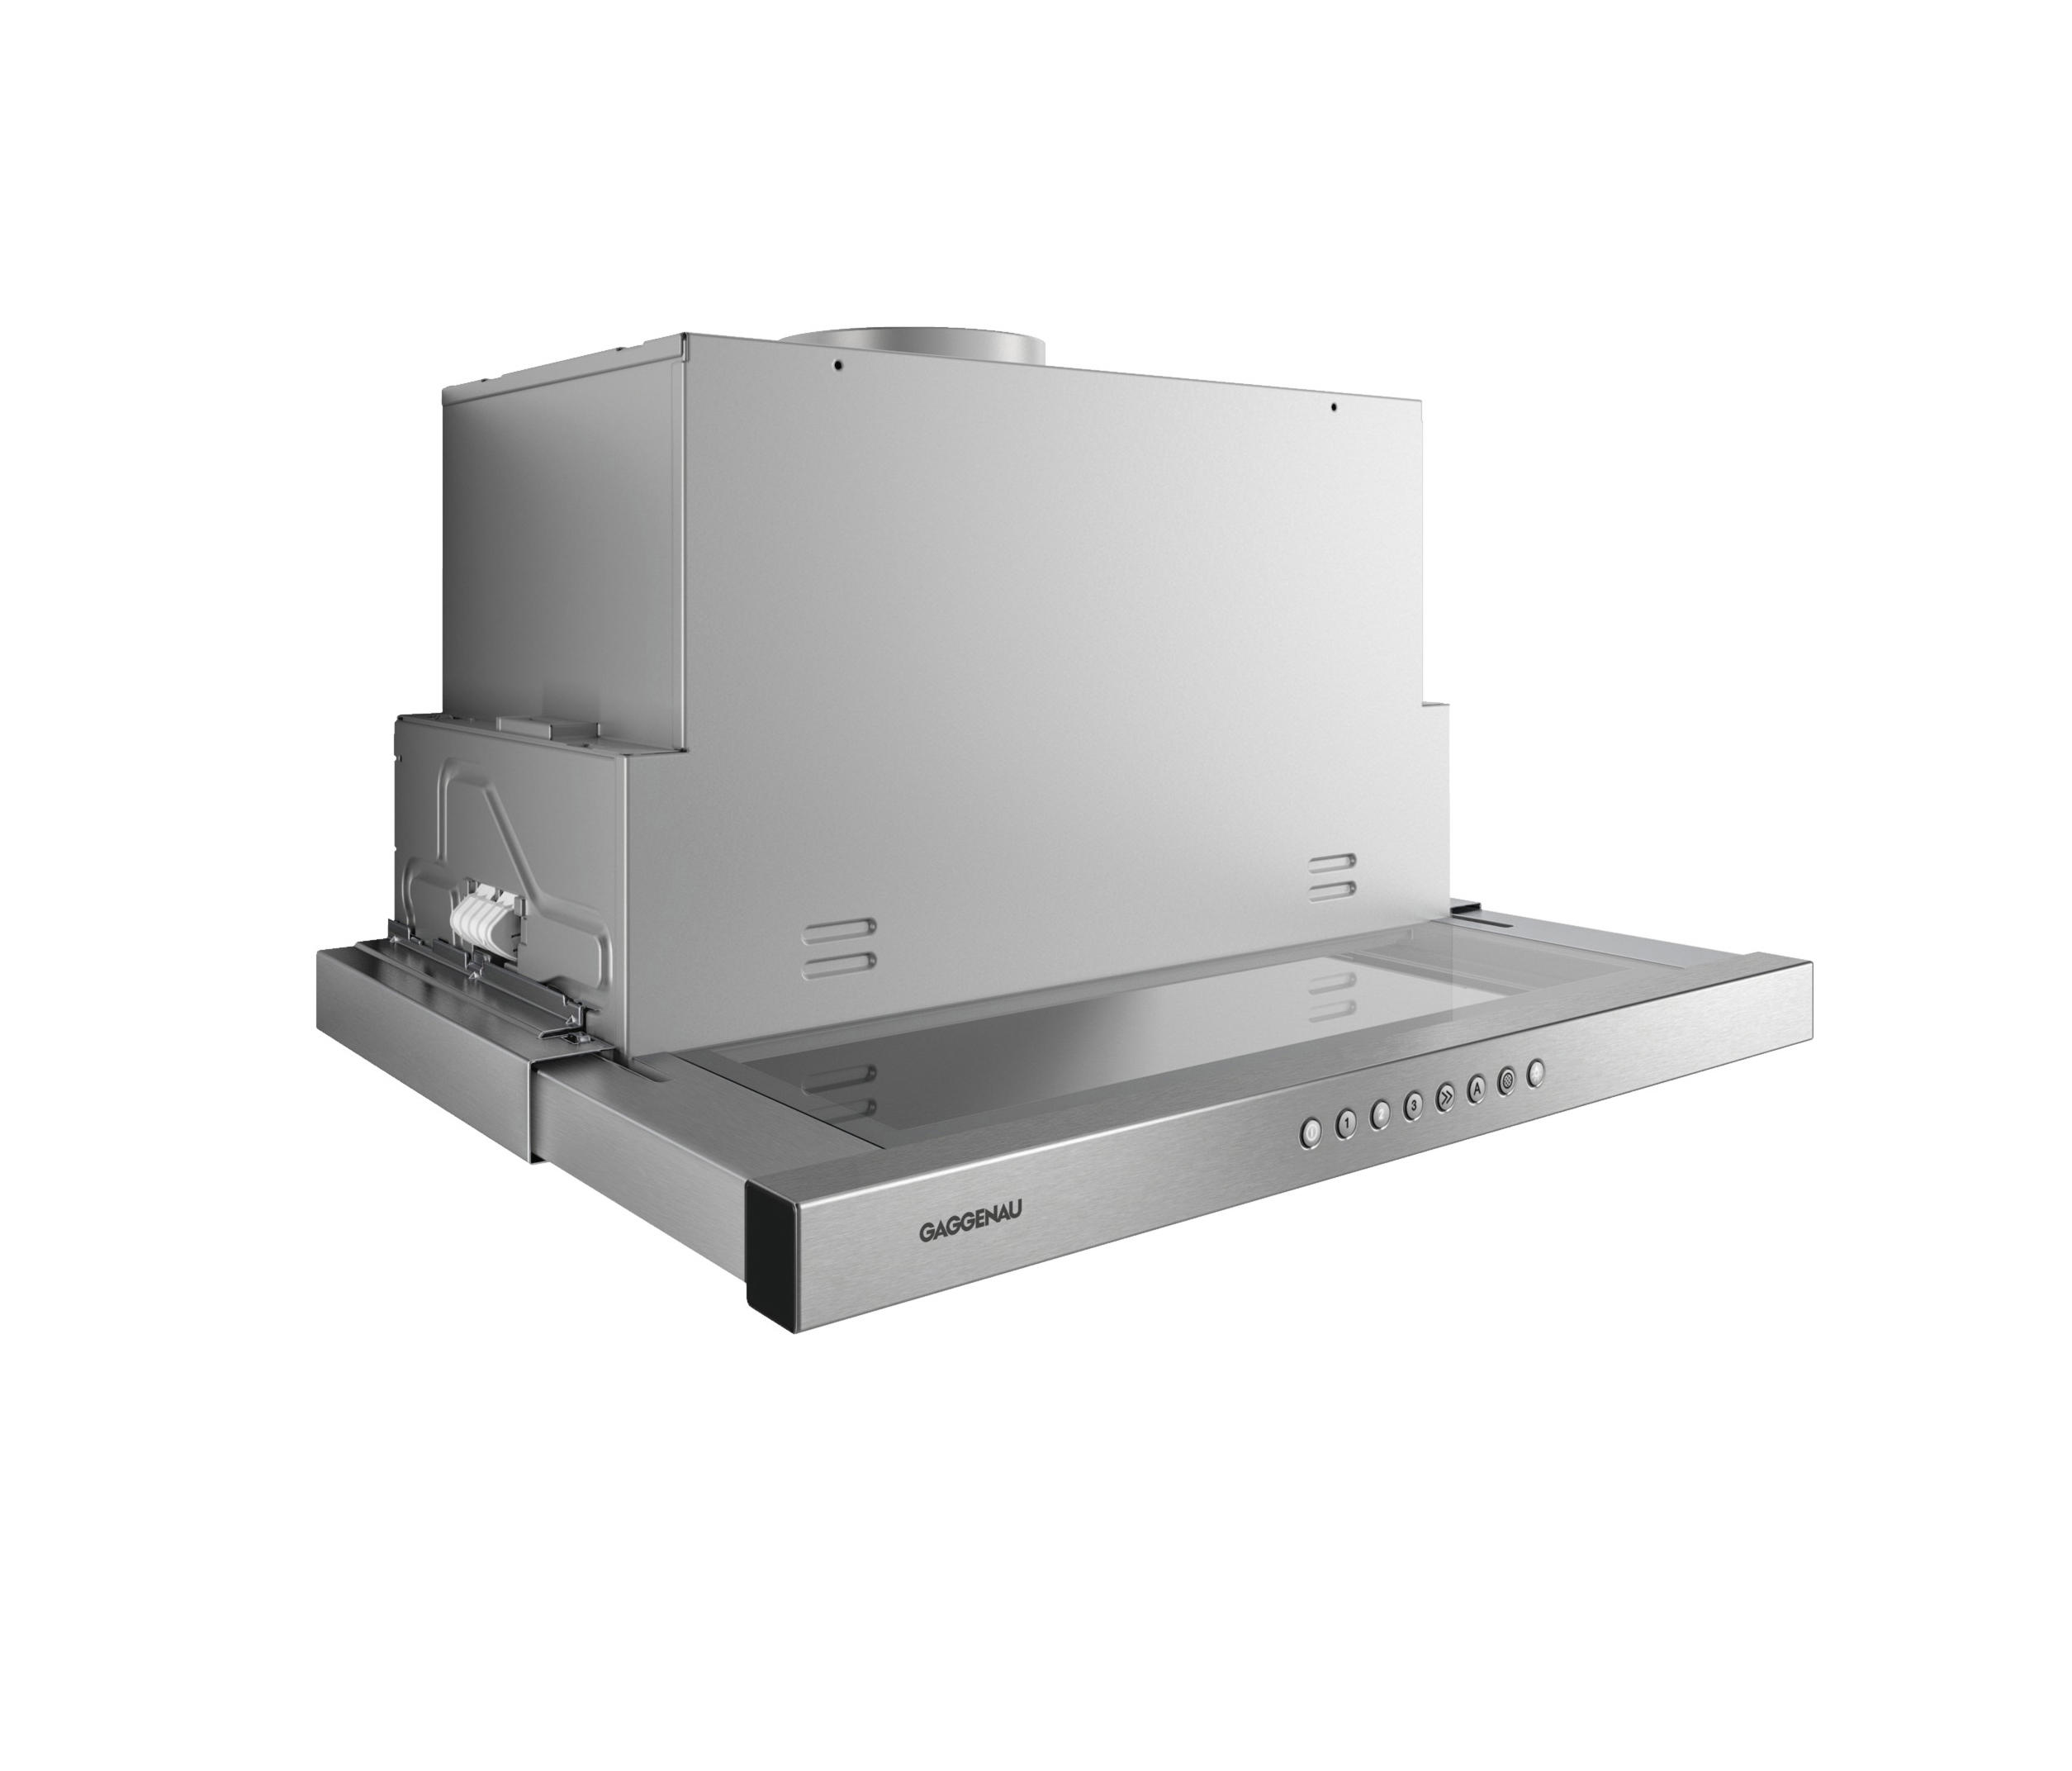 hotte tiroir s rie 200 af 210 hottes de cuisine de. Black Bedroom Furniture Sets. Home Design Ideas